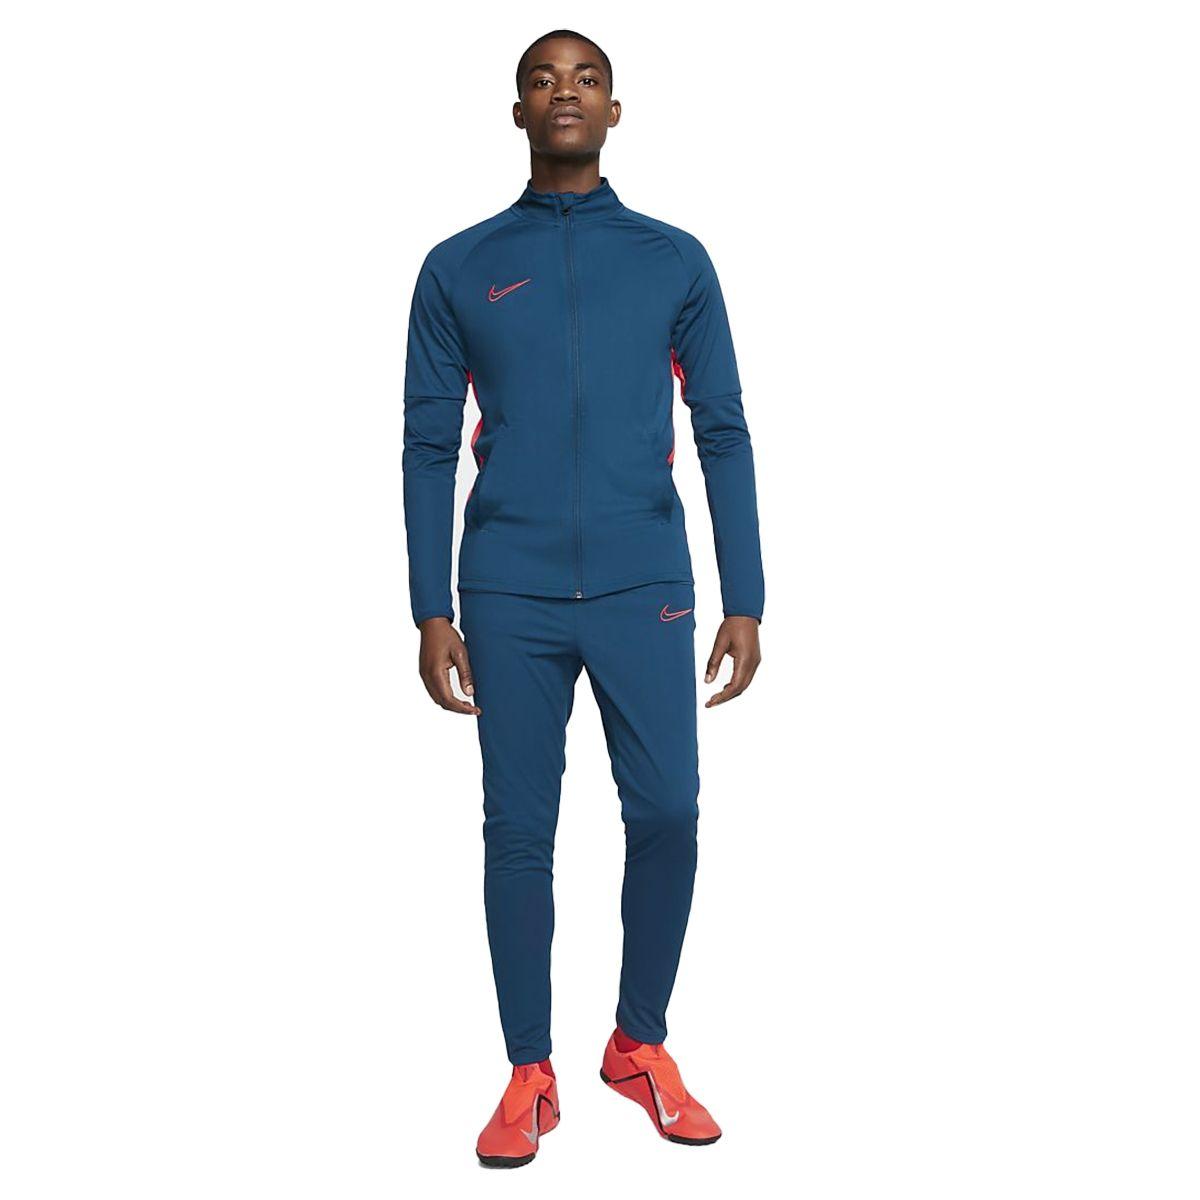 Nike Tuta Polestere Academy Uomo Blu